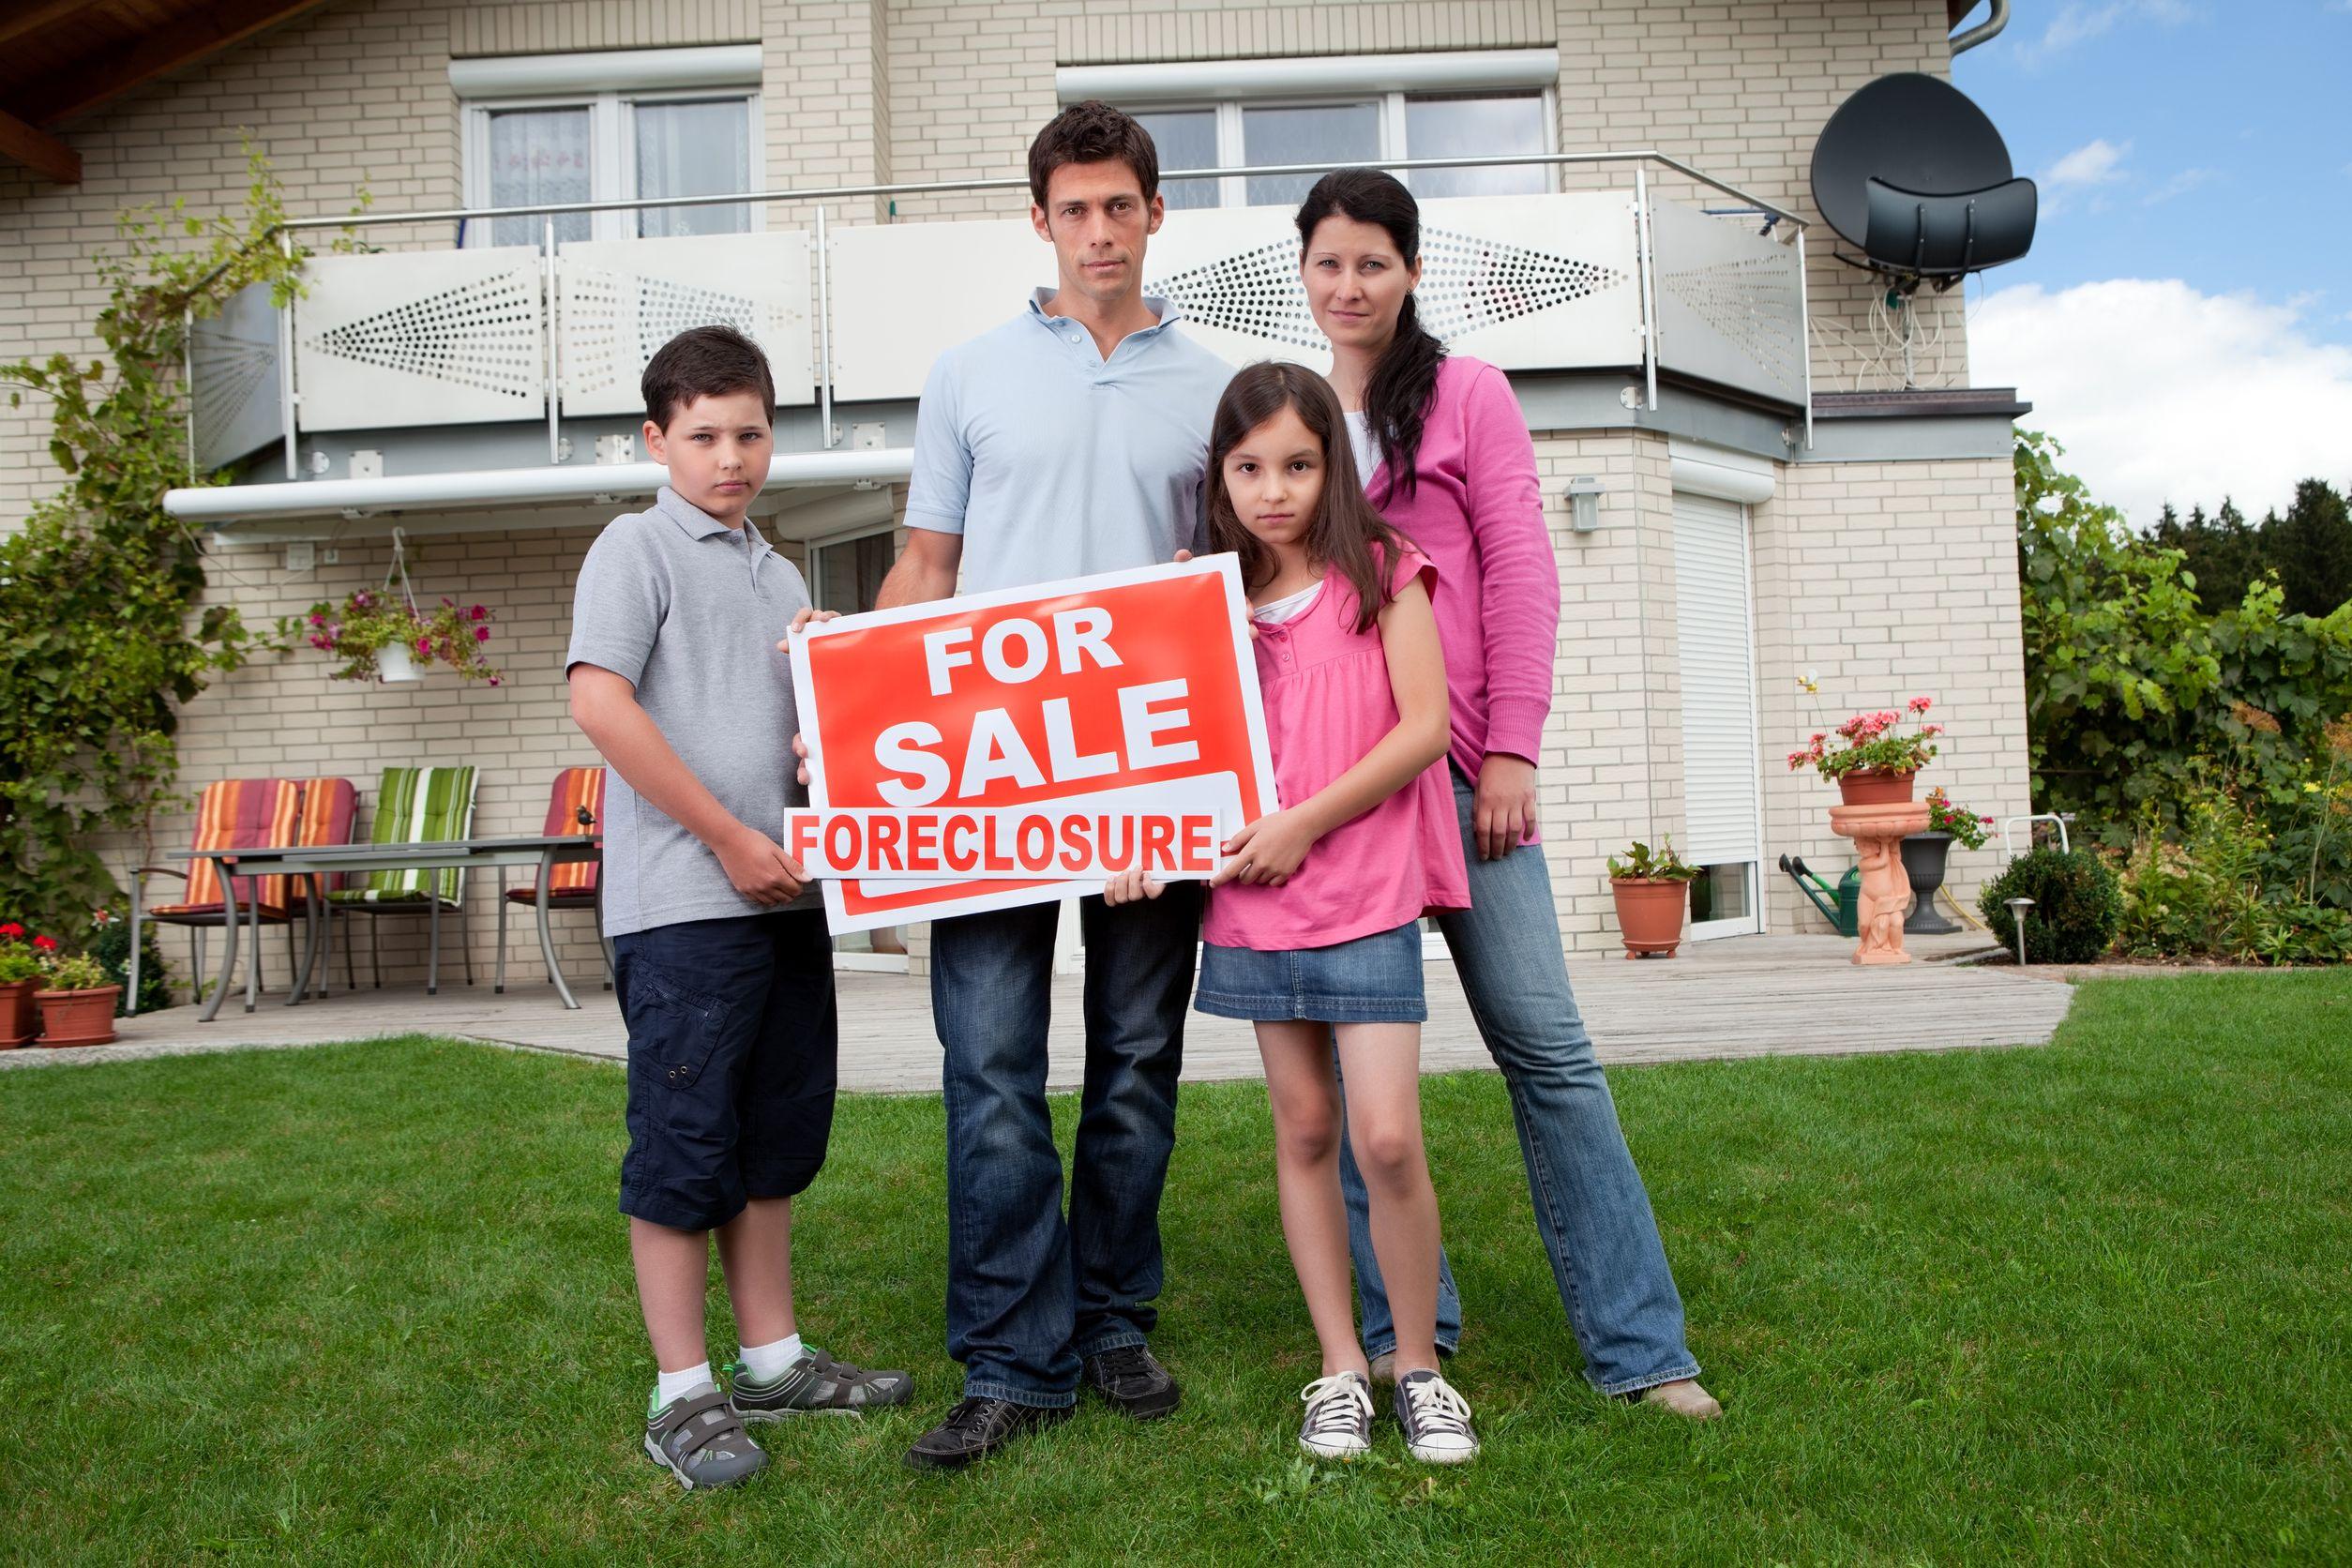 Prima casa quando equitalia pu pignorare o ipotecare - Pignoramento immobiliare prima casa ...